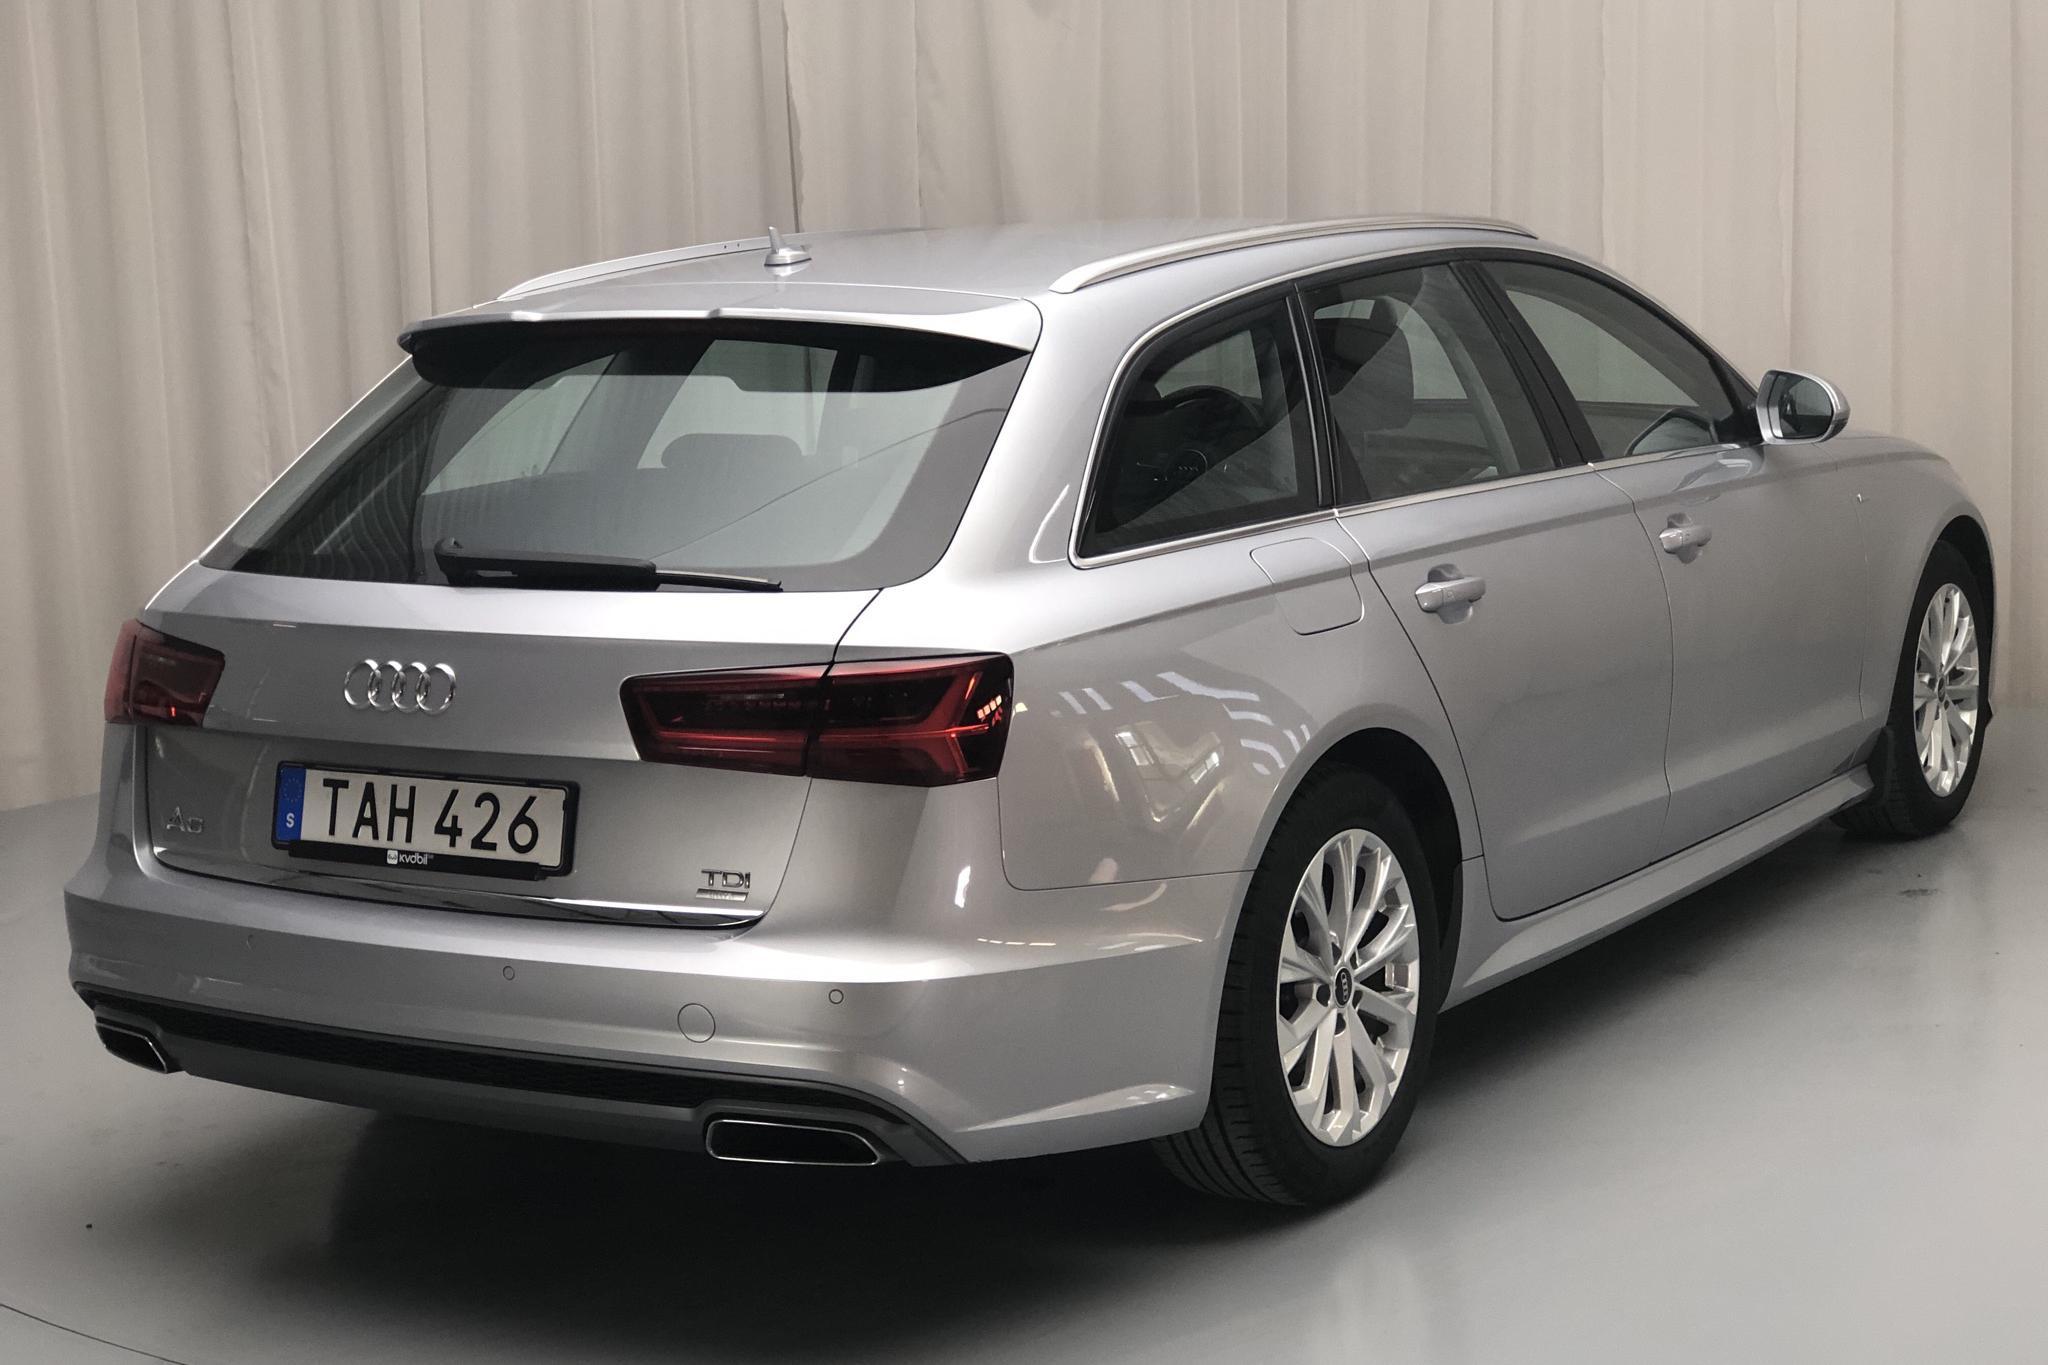 Audi A6 2.0 TDI Avant (190hk) - 83 240 km - Manual - silver - 2016